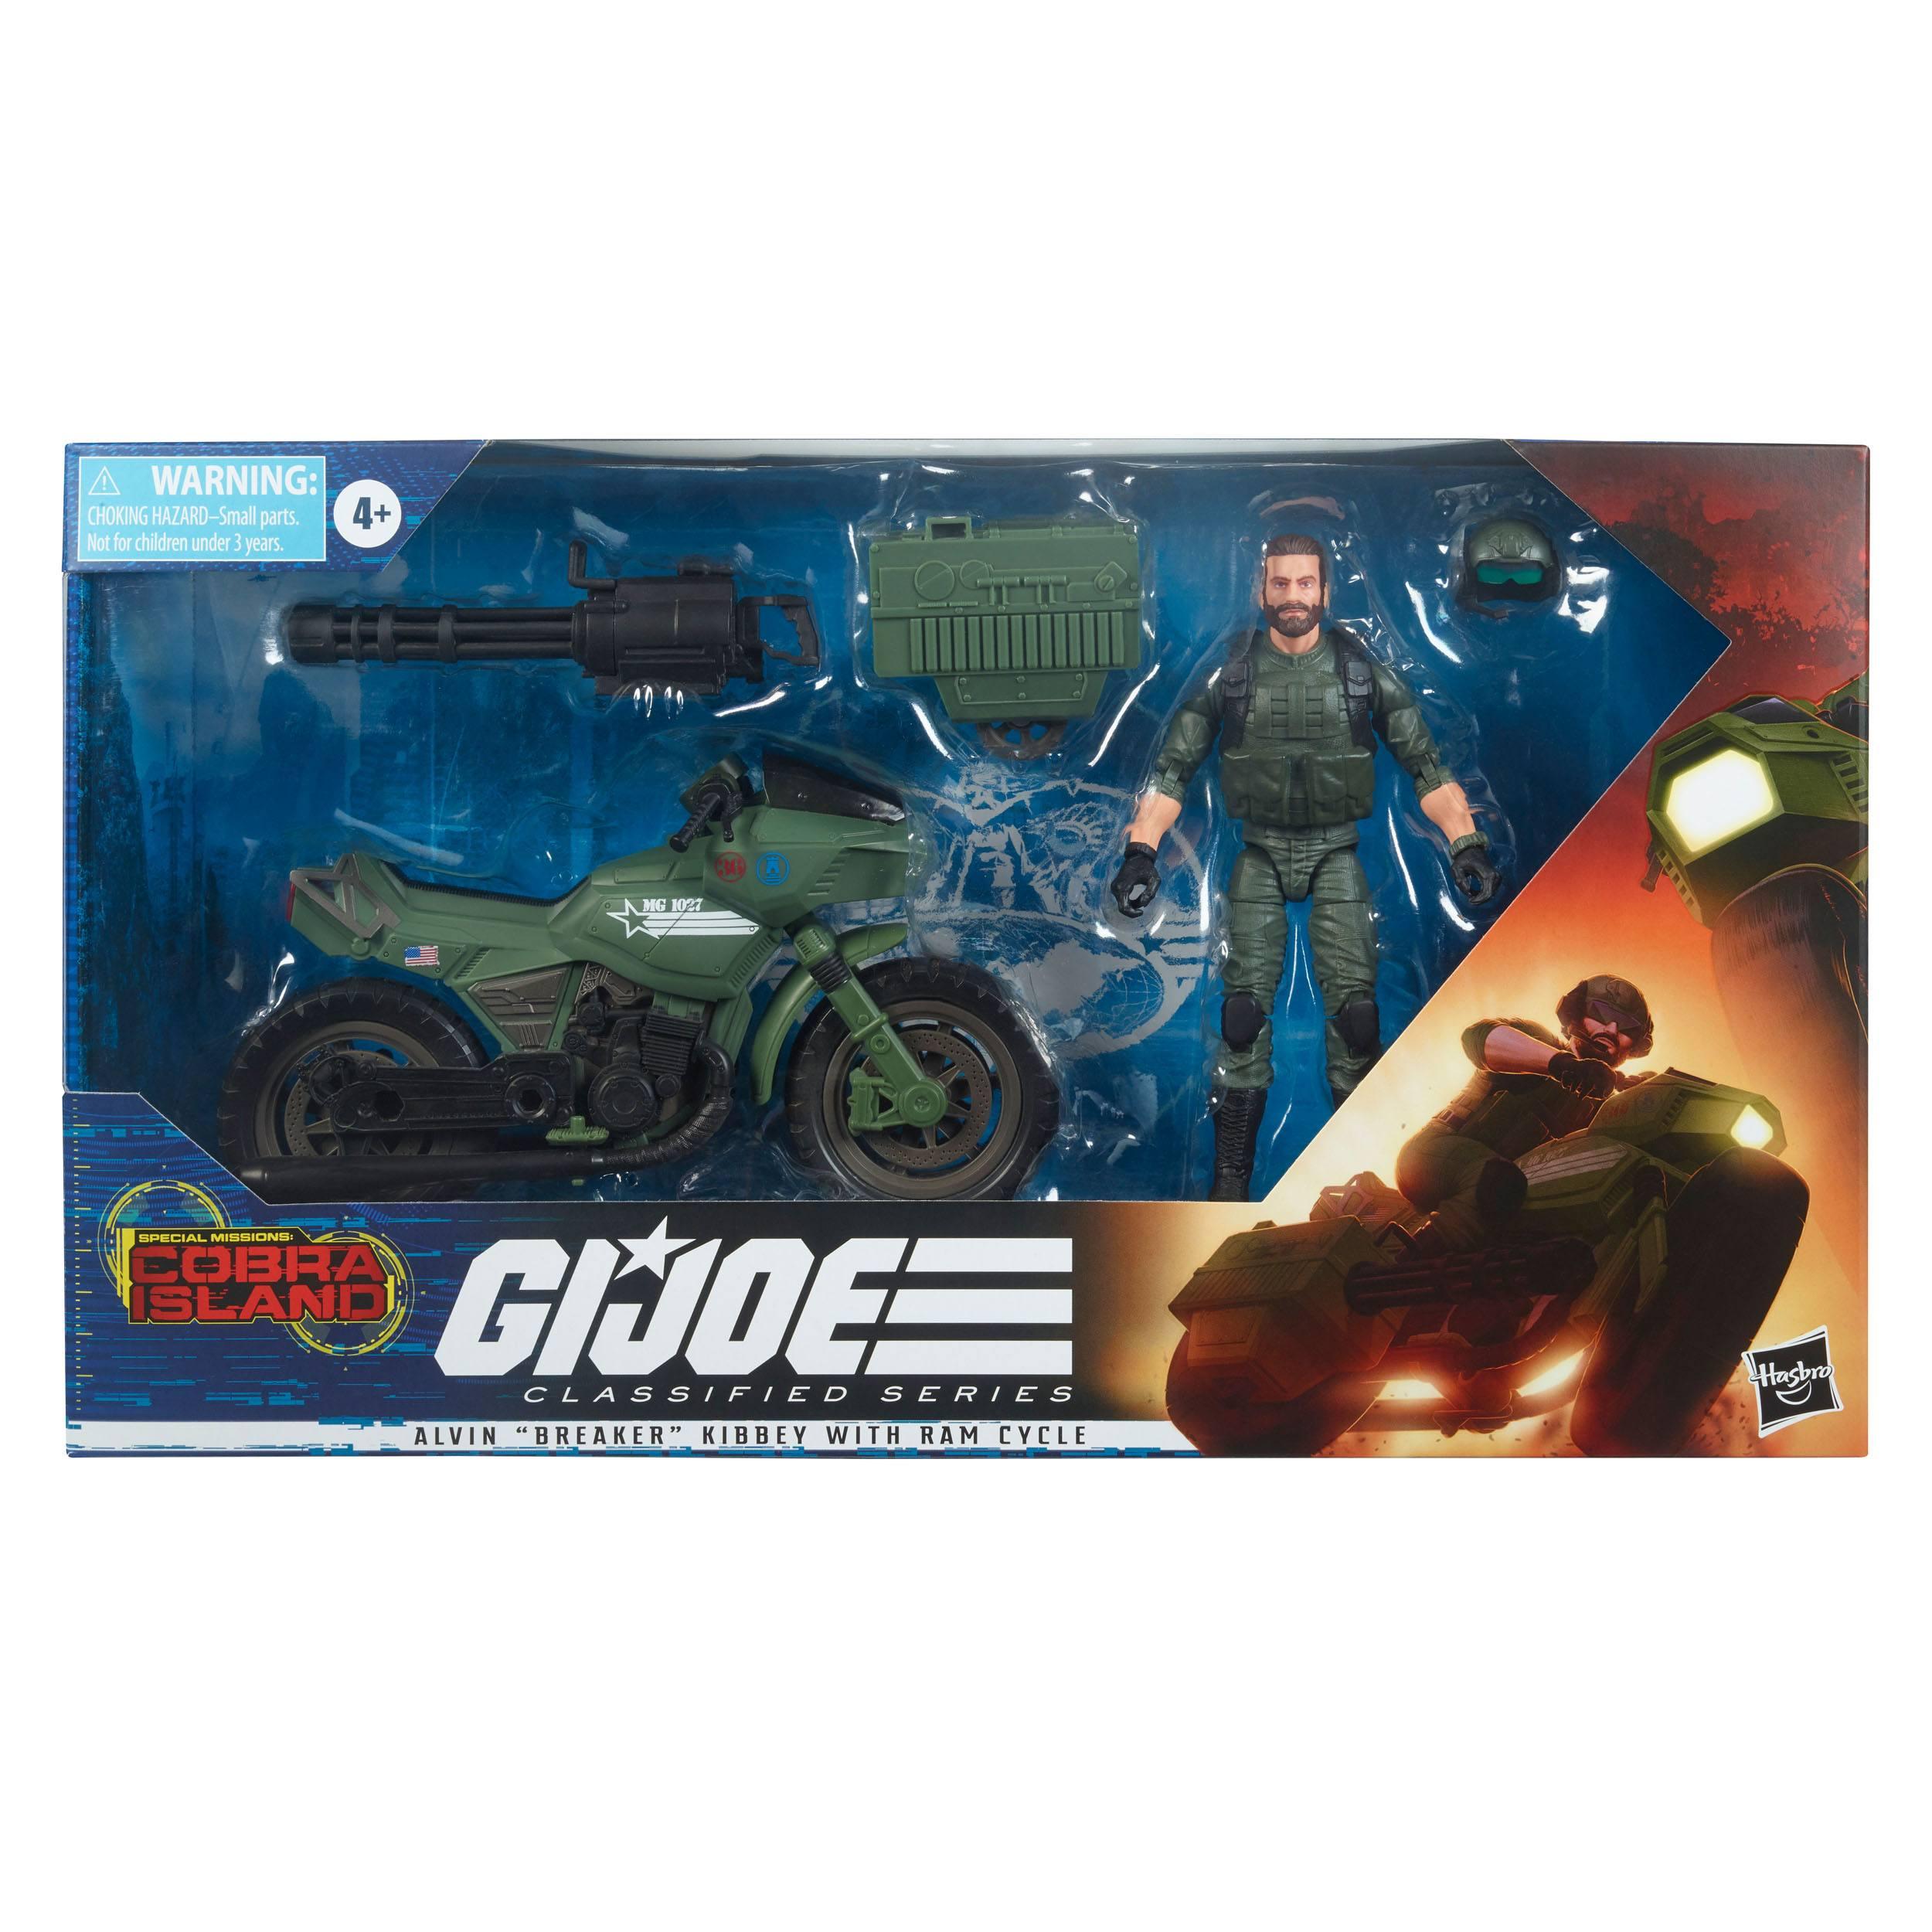 G.I. Joe Classified Series Cobra Island Actionfigur 2021 Alvin Breaker Kibbey with Ram Cycle 15 cm F07625L00 5010993836475